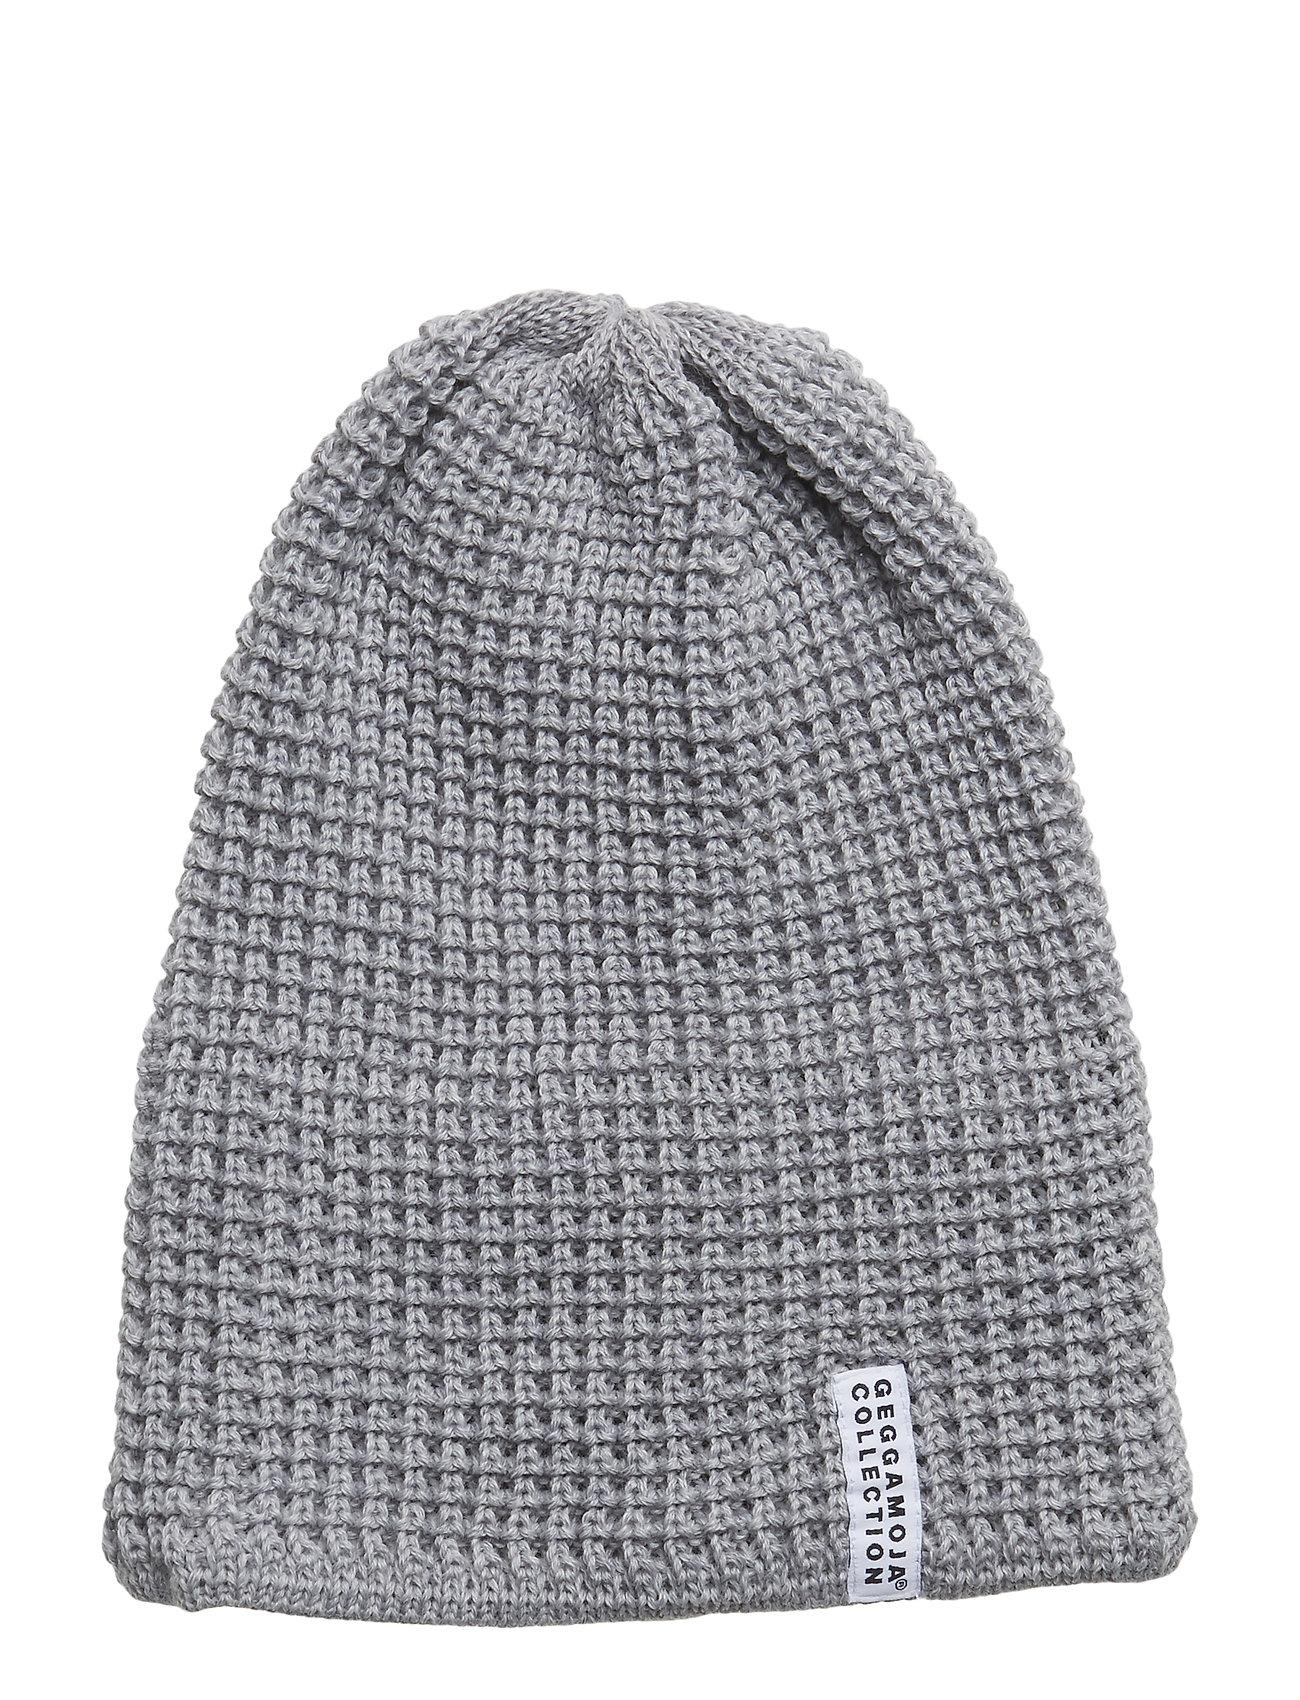 Image of Knitted Beanie Hat Grå GEGGAMOJA (3075387905)